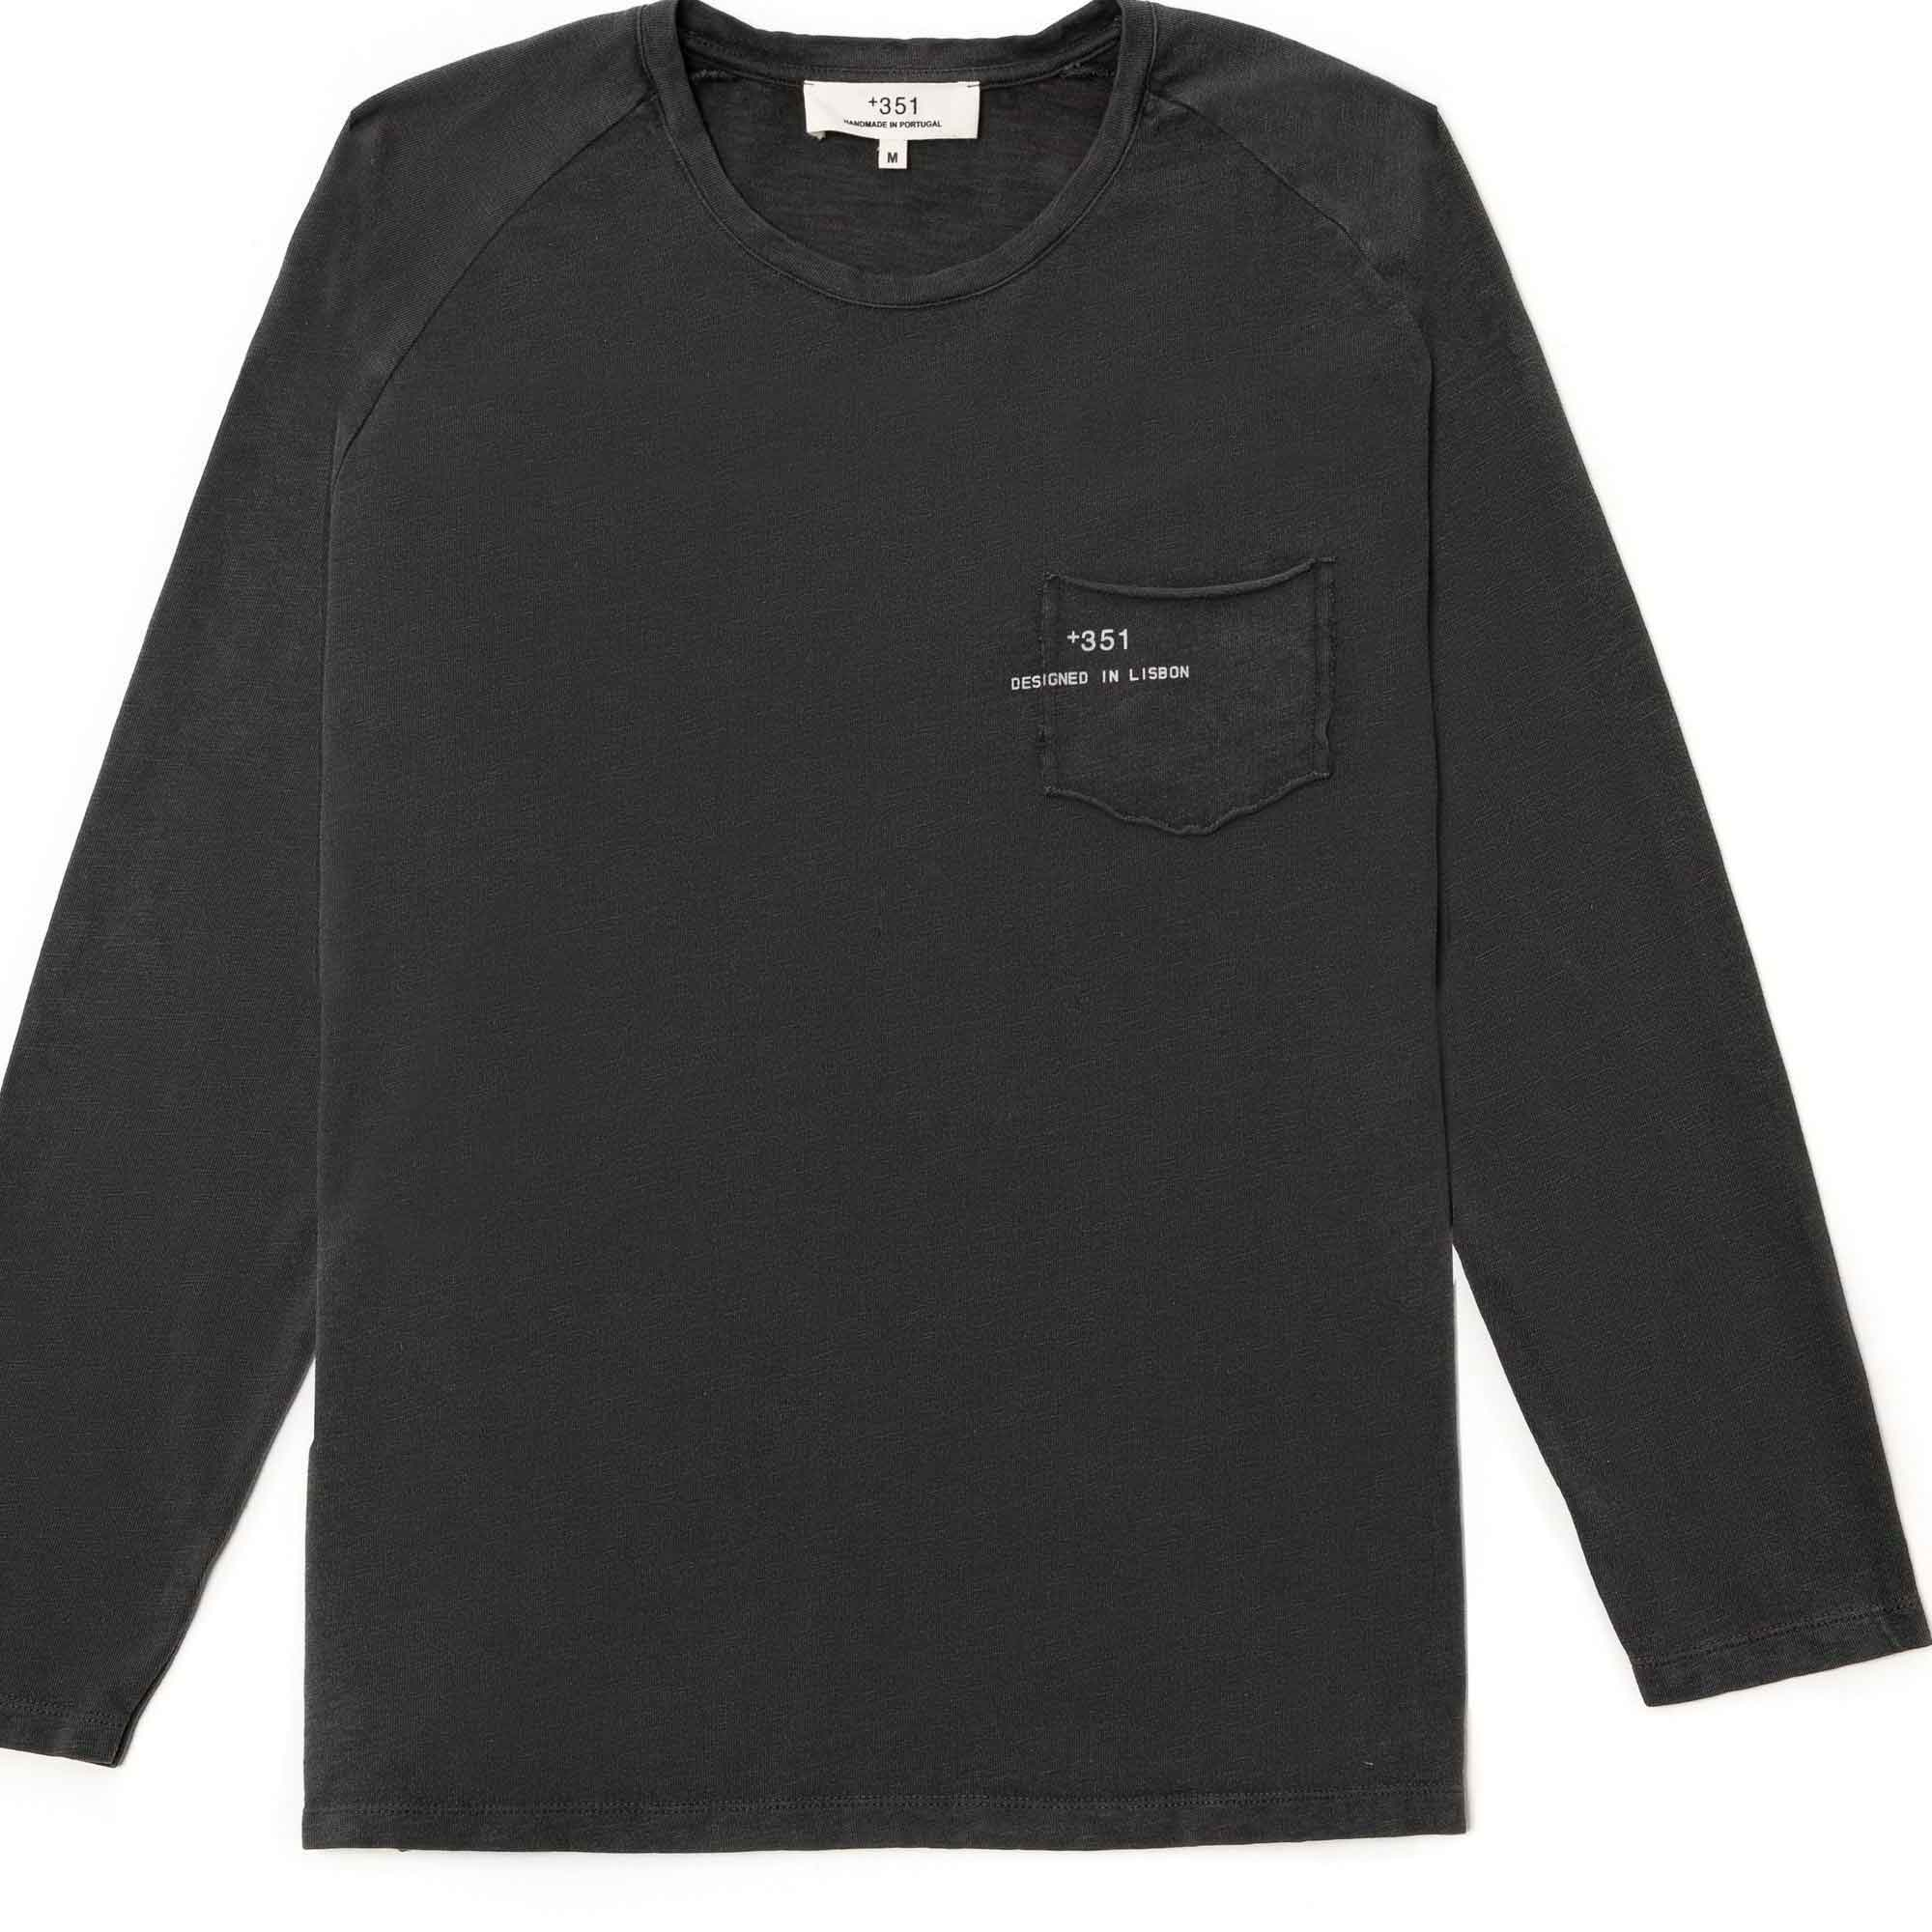 T-shirt manga larga negra con bolsa y logo impreso en la bolsa